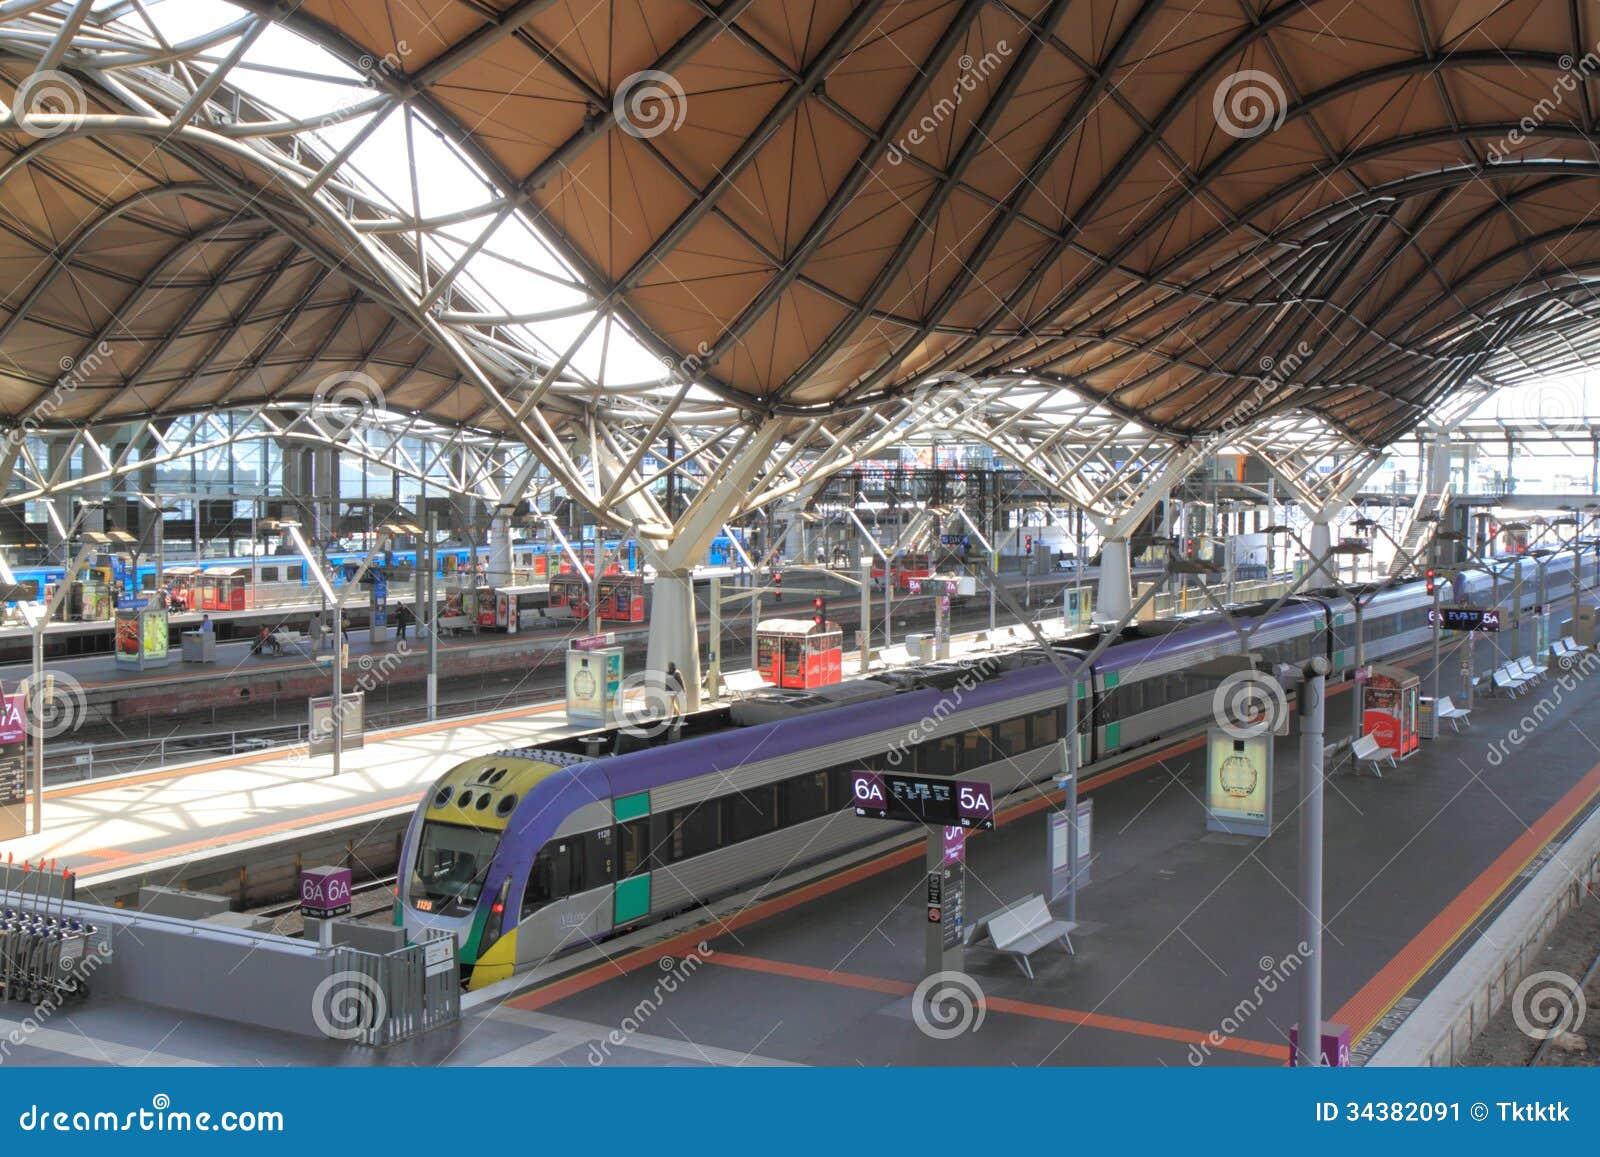 southern cross train station melbourne editorial photo. Black Bedroom Furniture Sets. Home Design Ideas